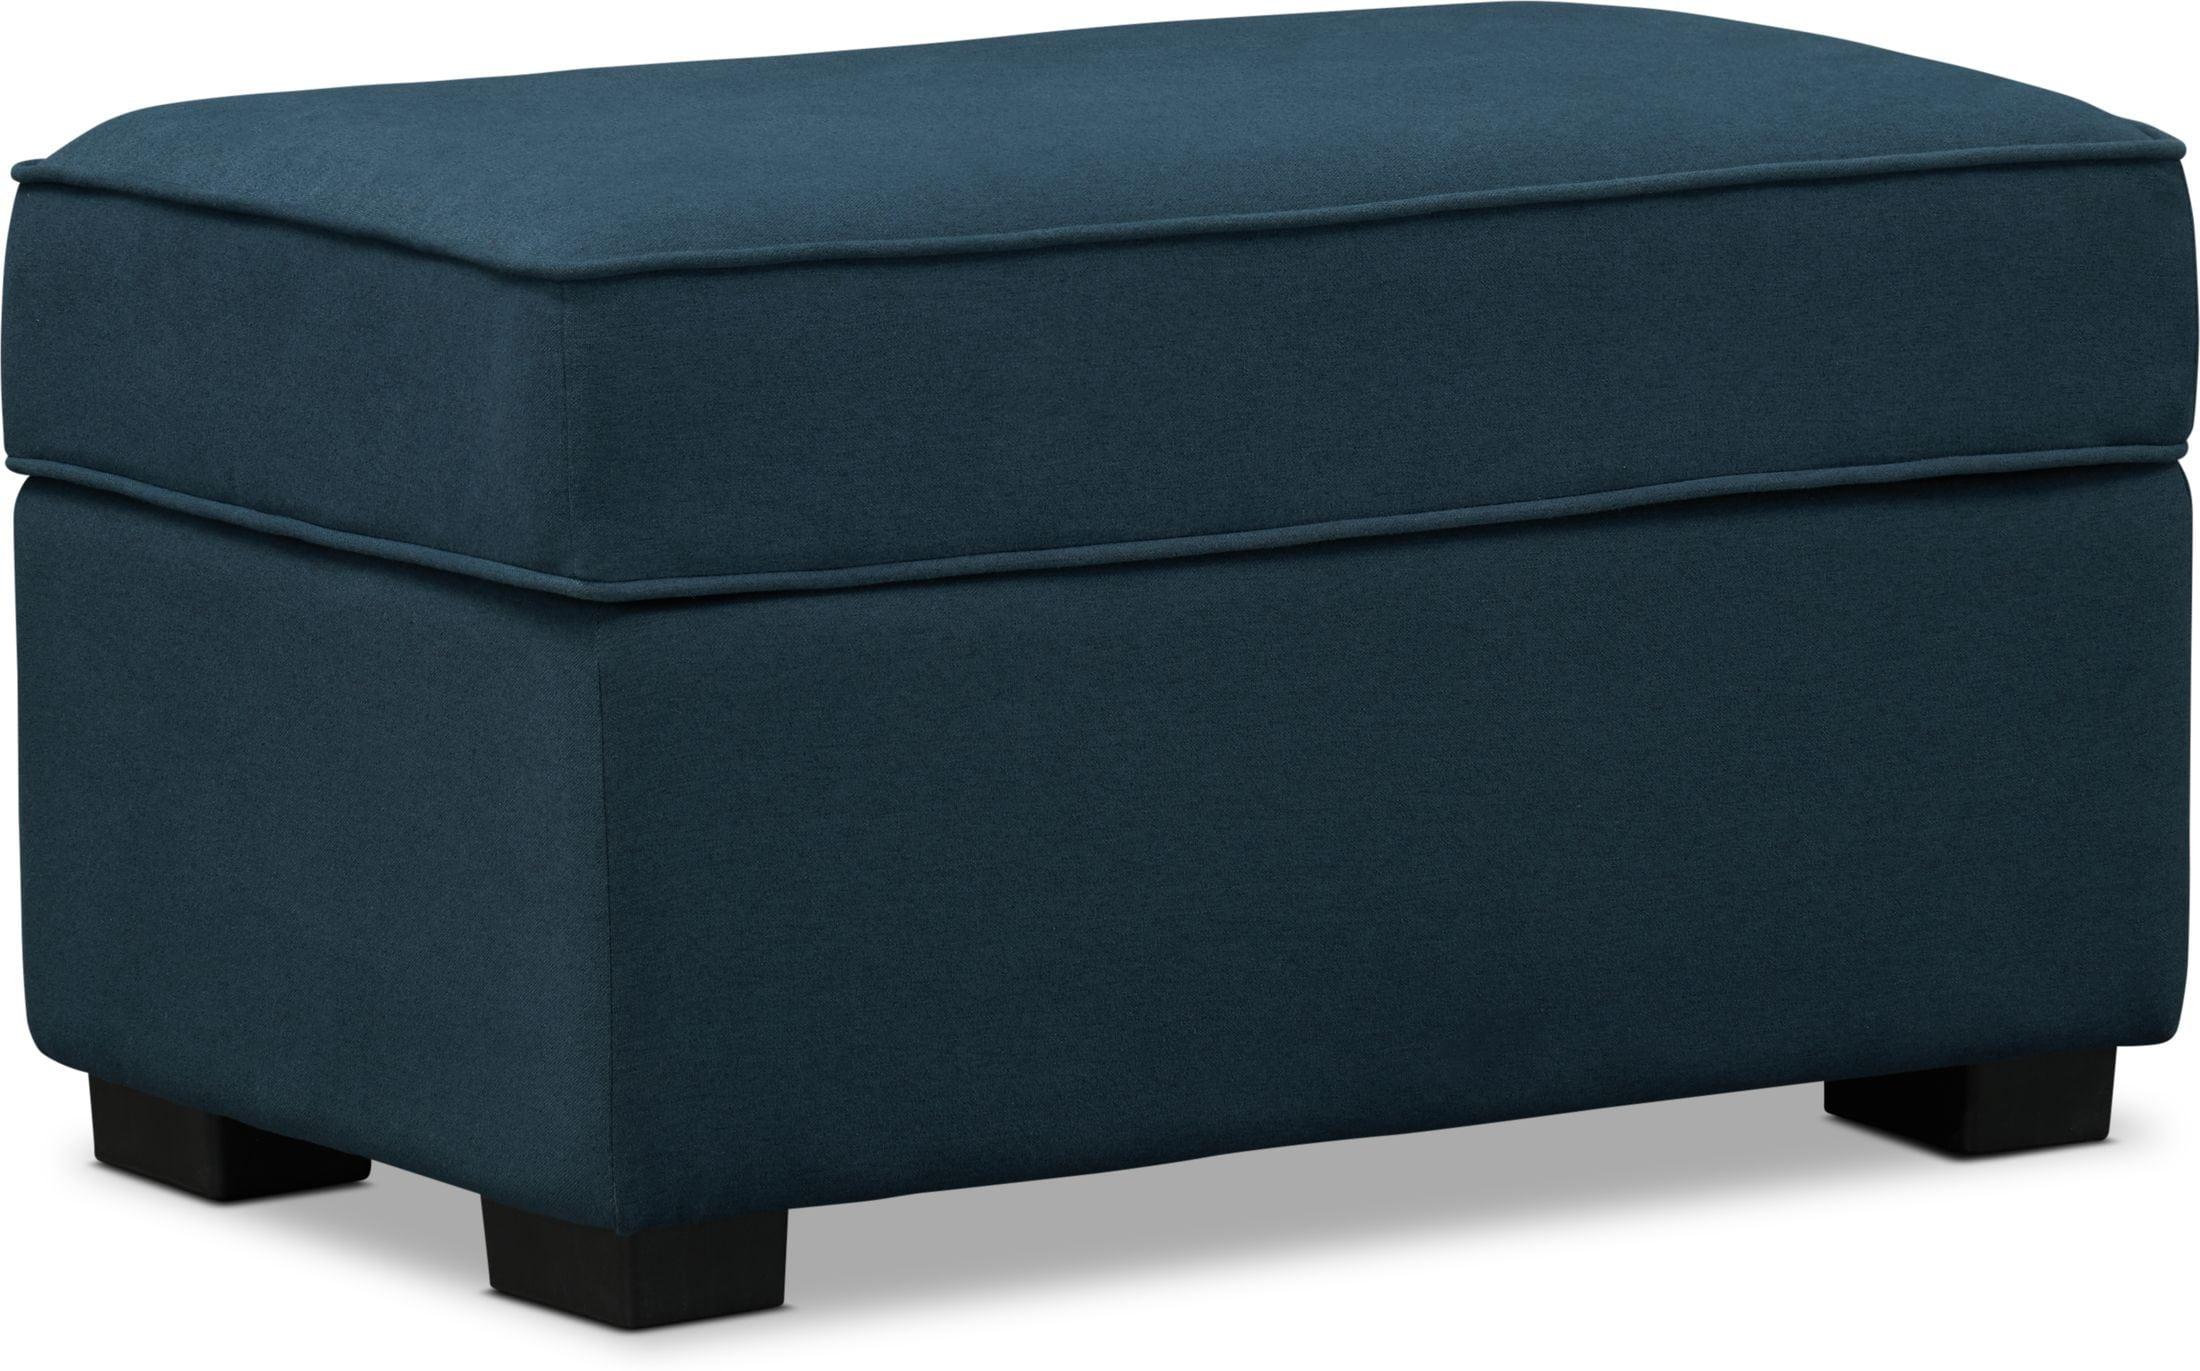 Living Room Furniture - Rhea Storage Ottoman - Navy